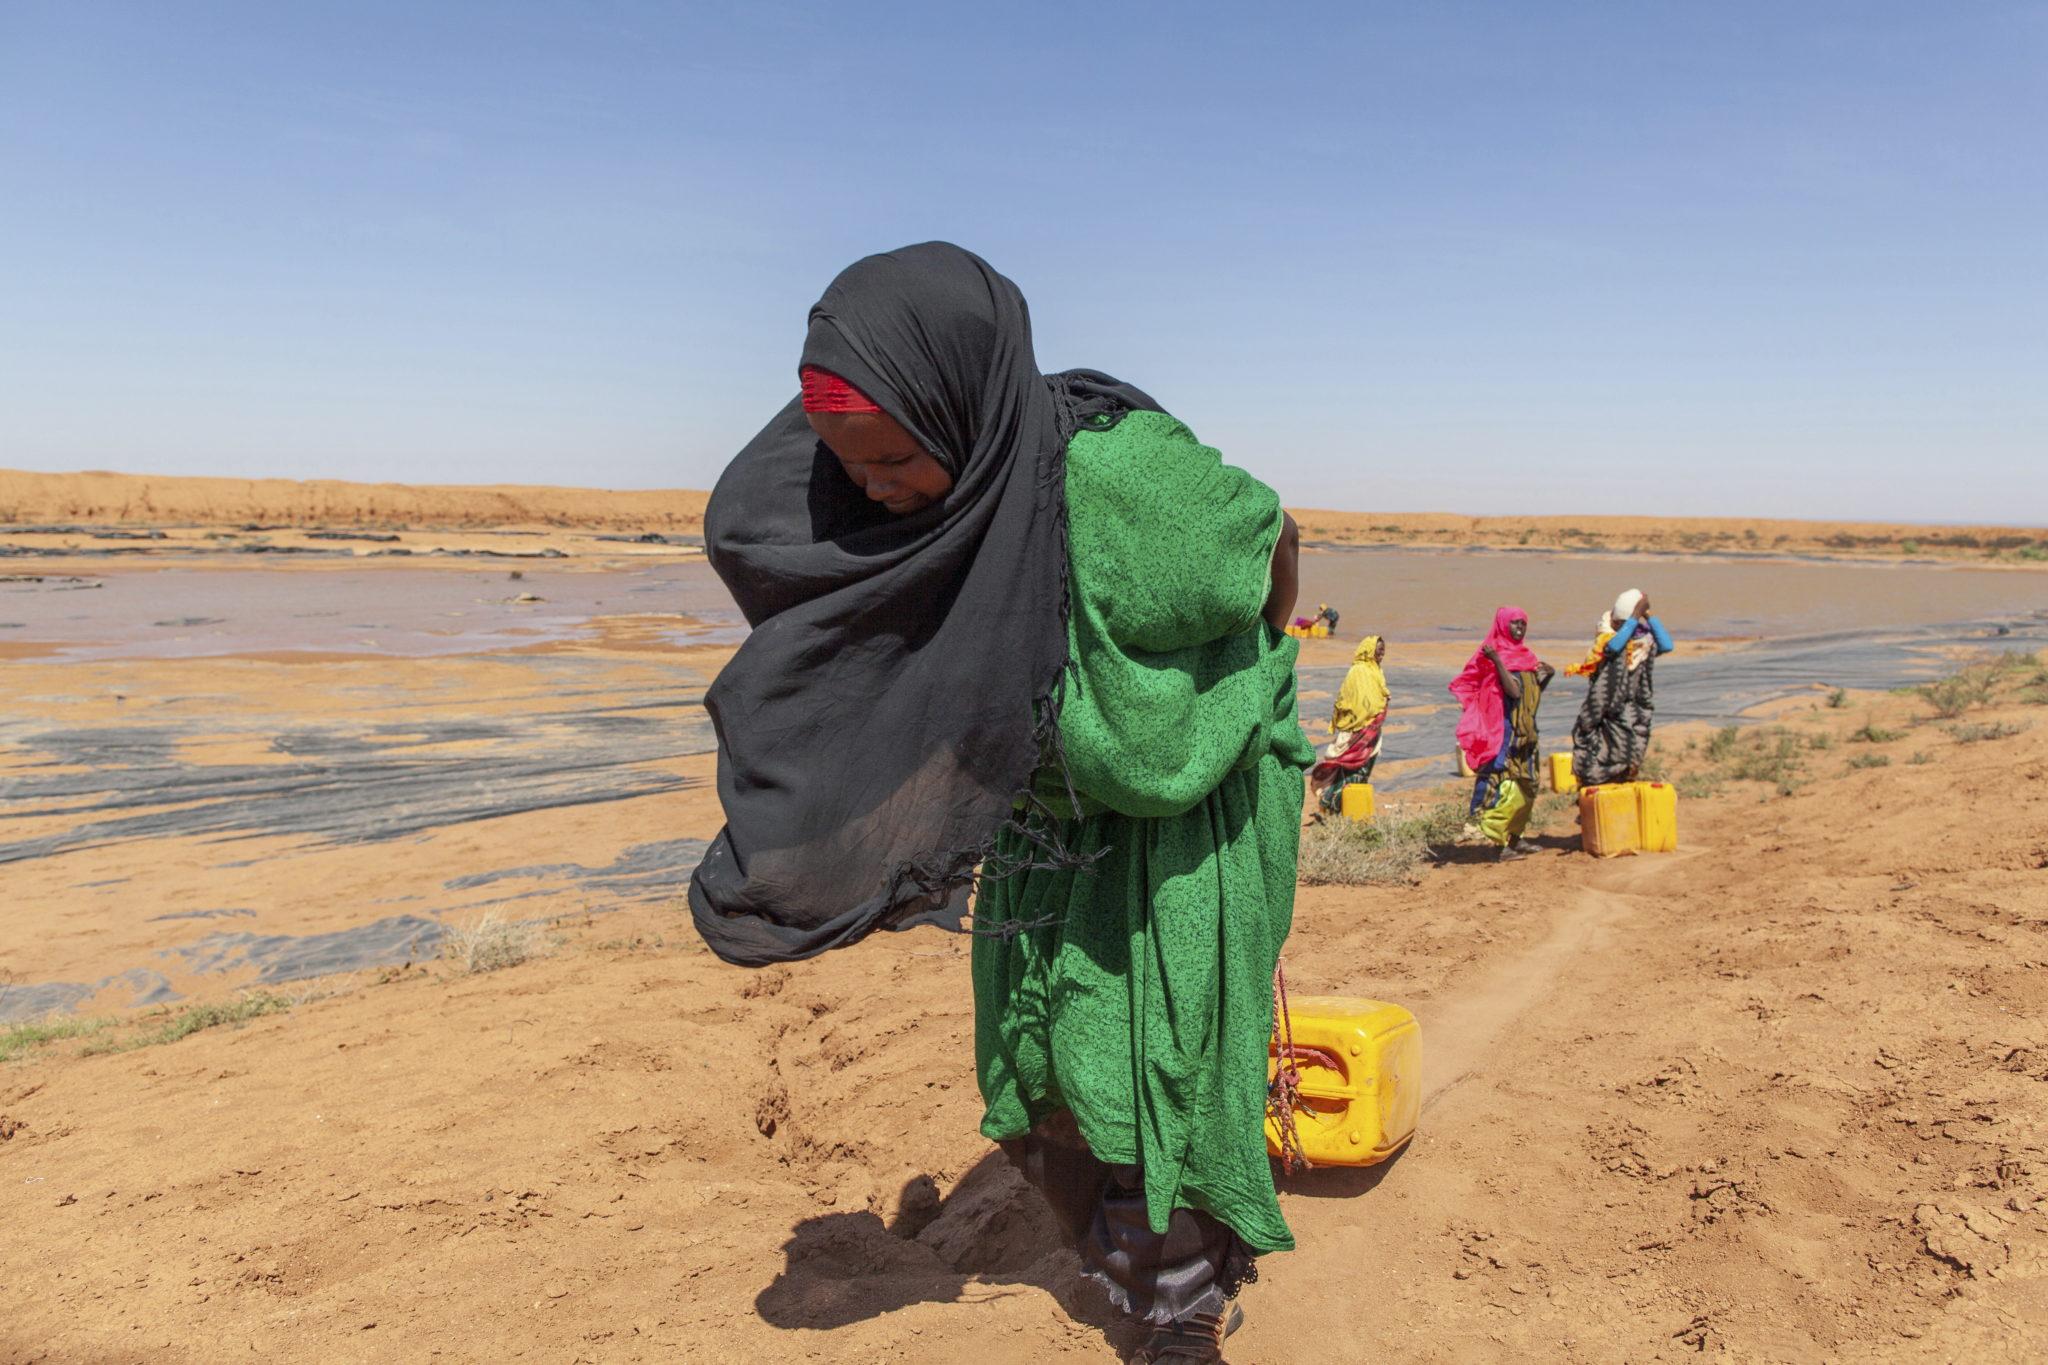 Susza w Somalii. fot. EPA/MARK NAFTALIN / UNITED NATIONS DEVELOPMENT PROGRAMME